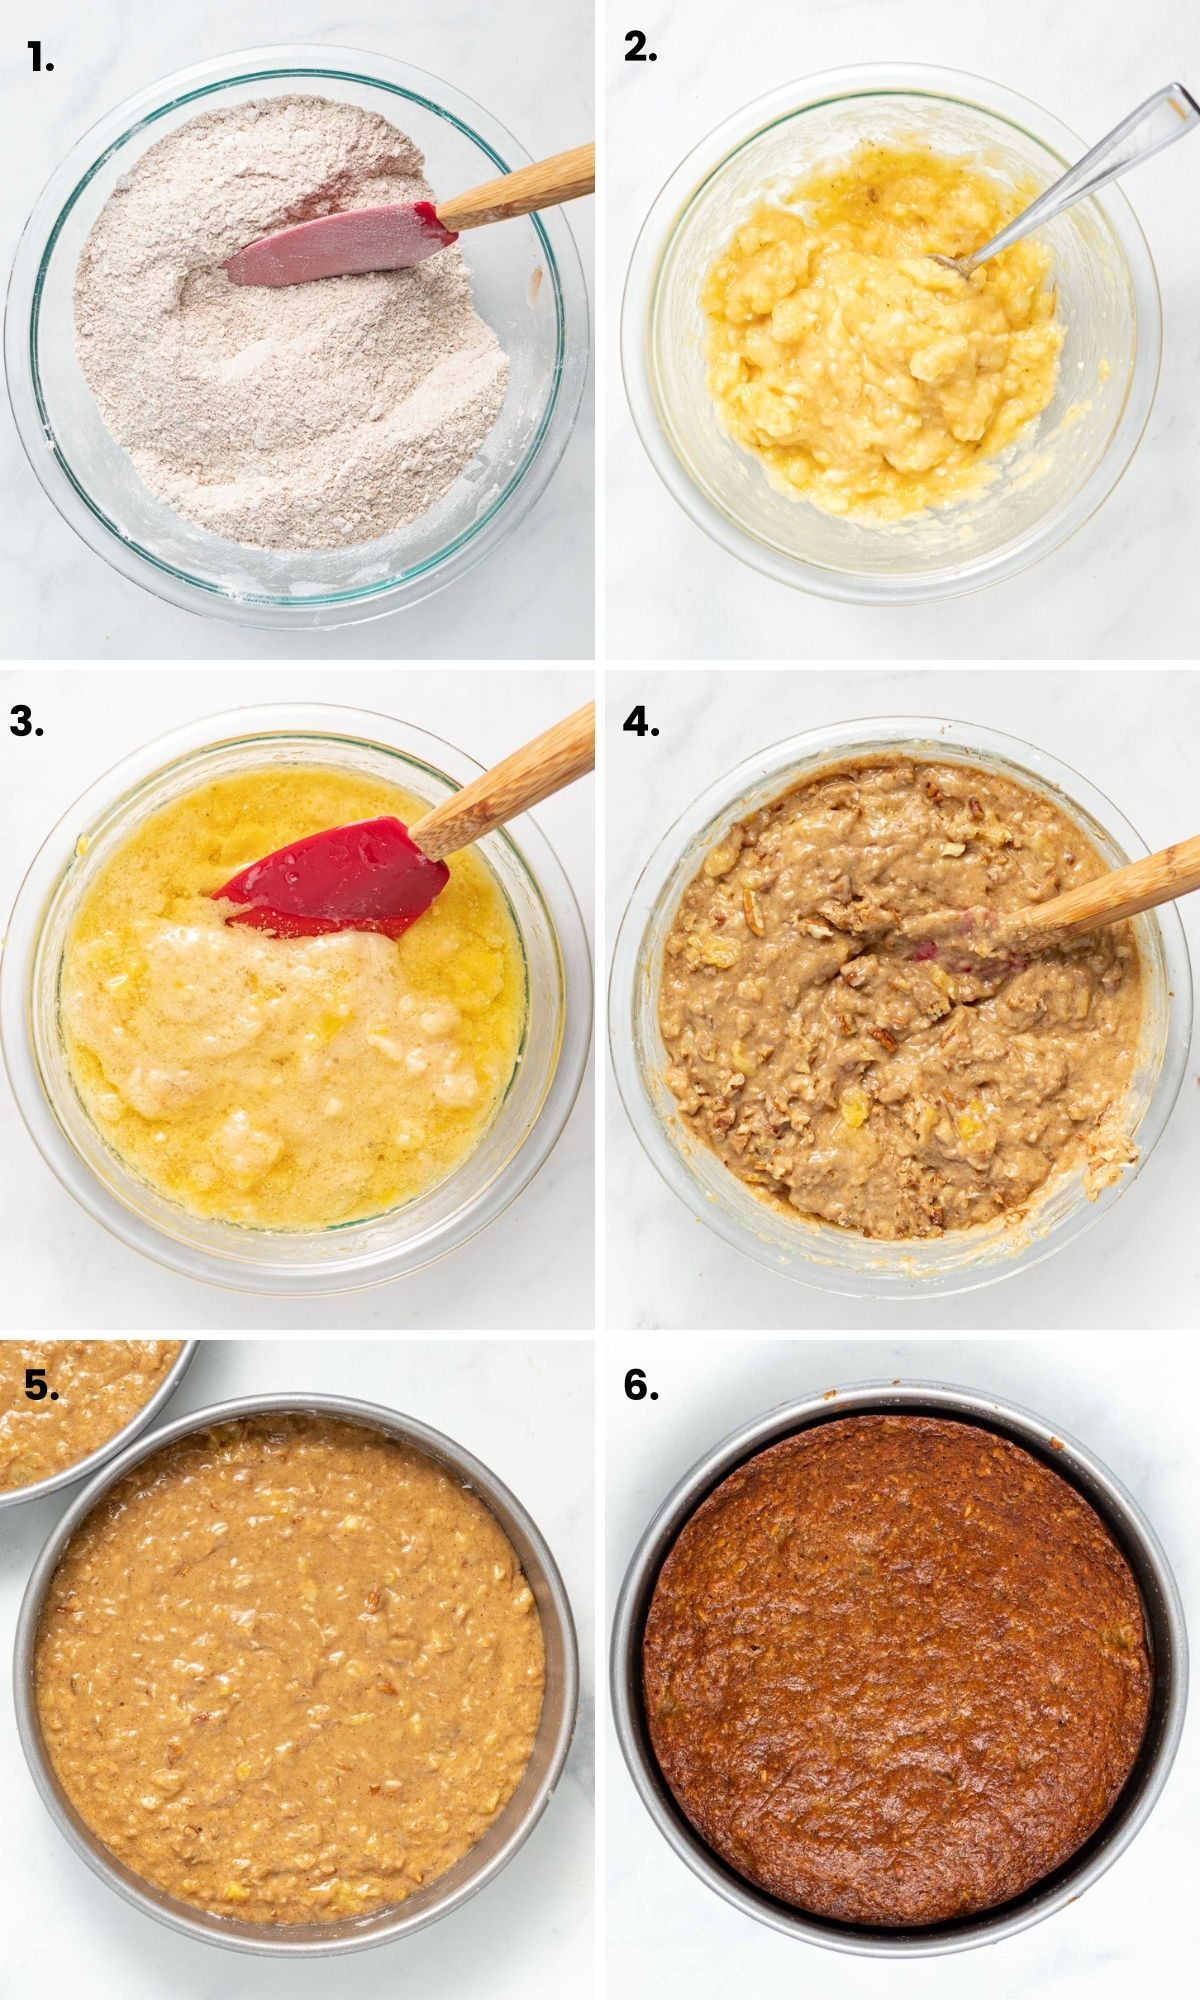 process photos showing how to make a vegan hummingbird cake as per written instructions